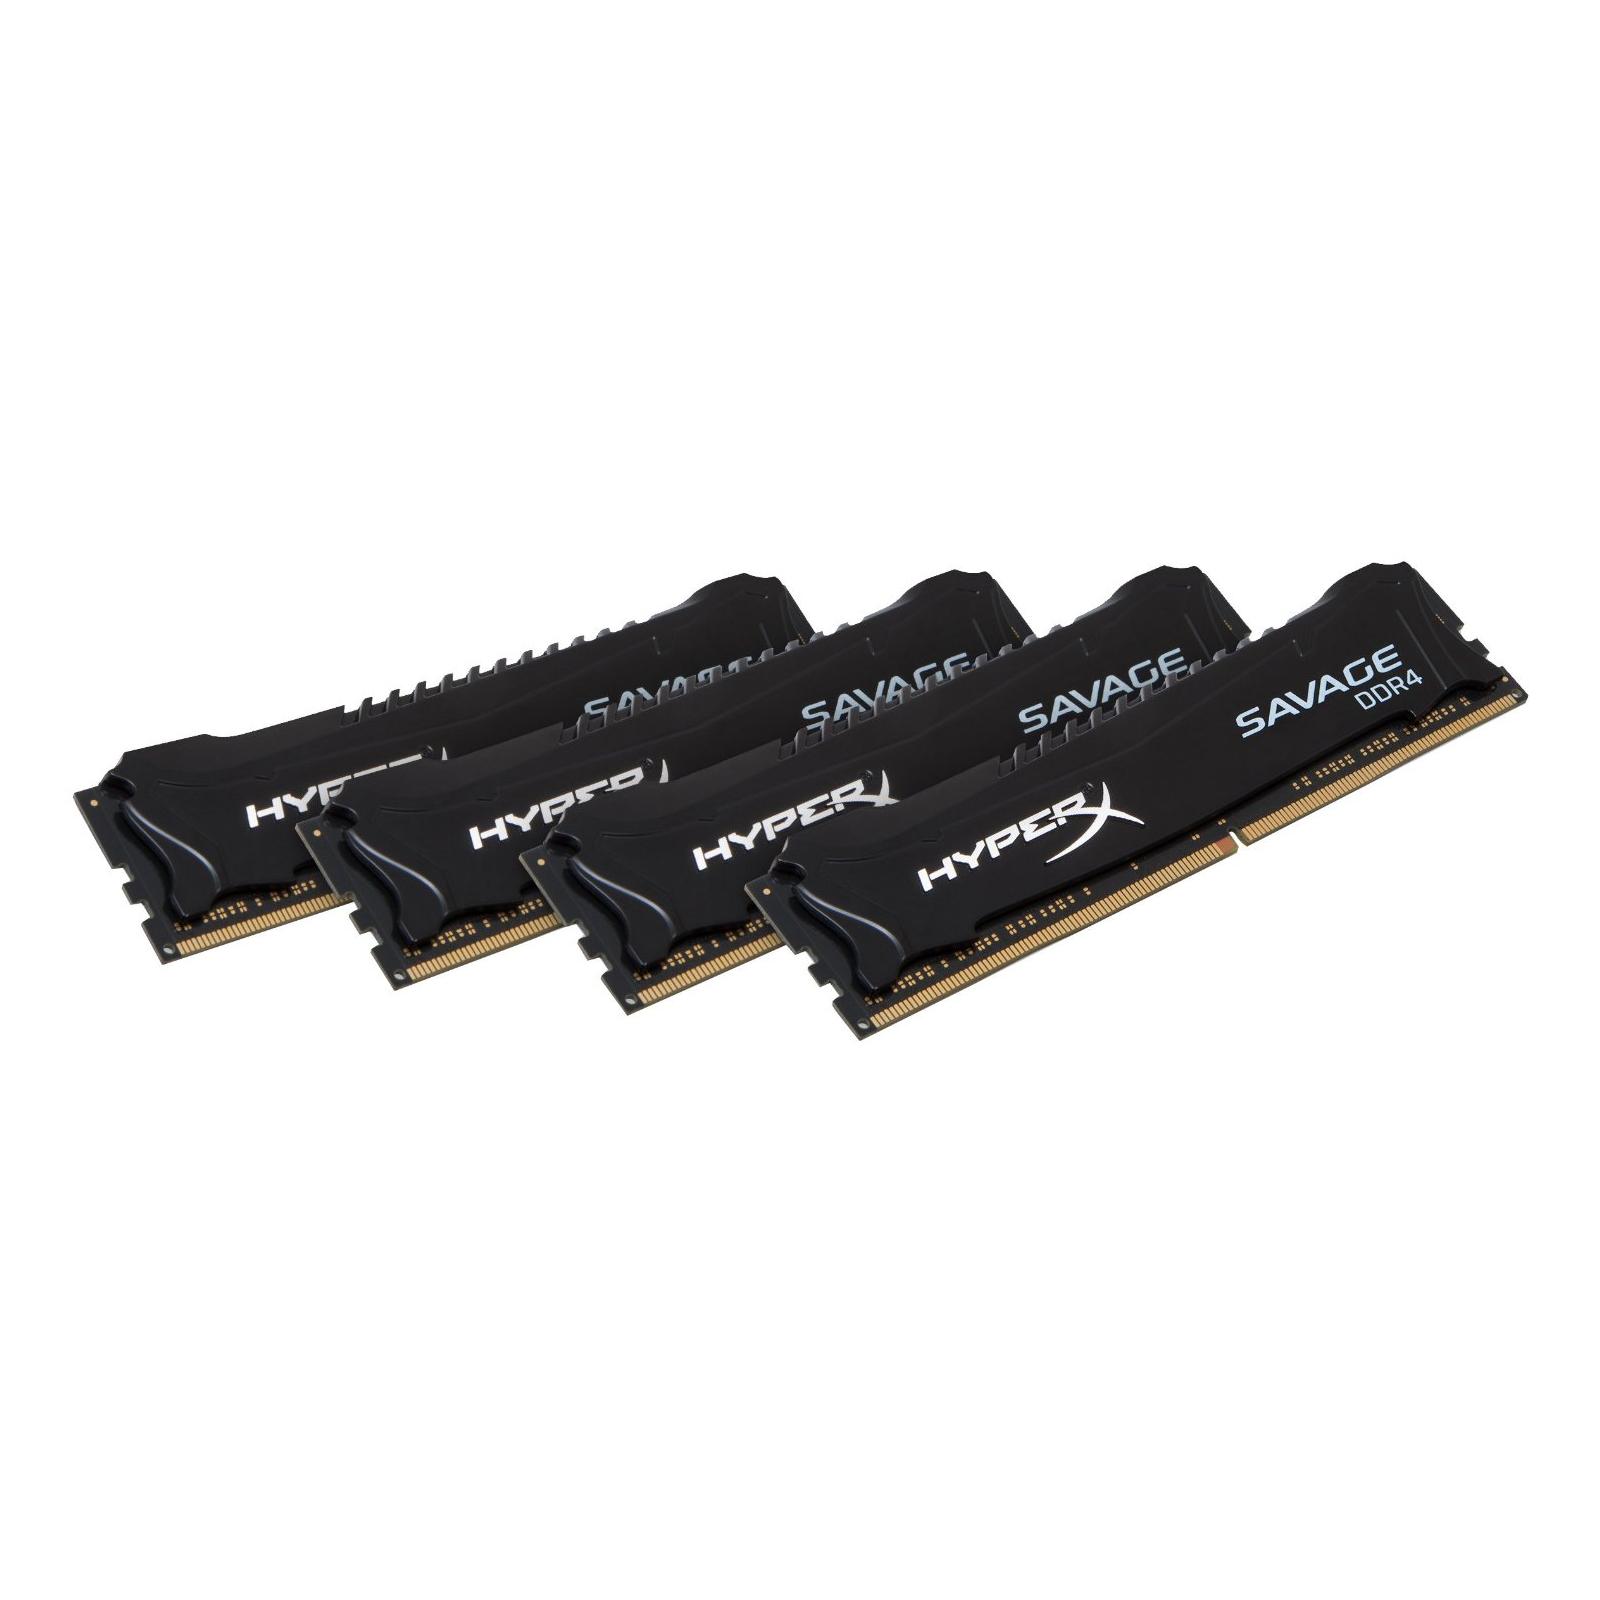 Модуль памяти для компьютера DDR4 32GB (4x8GB) 2800 MHz HyperX Savage Kingston (HX428C14SBK4/32) изображение 2